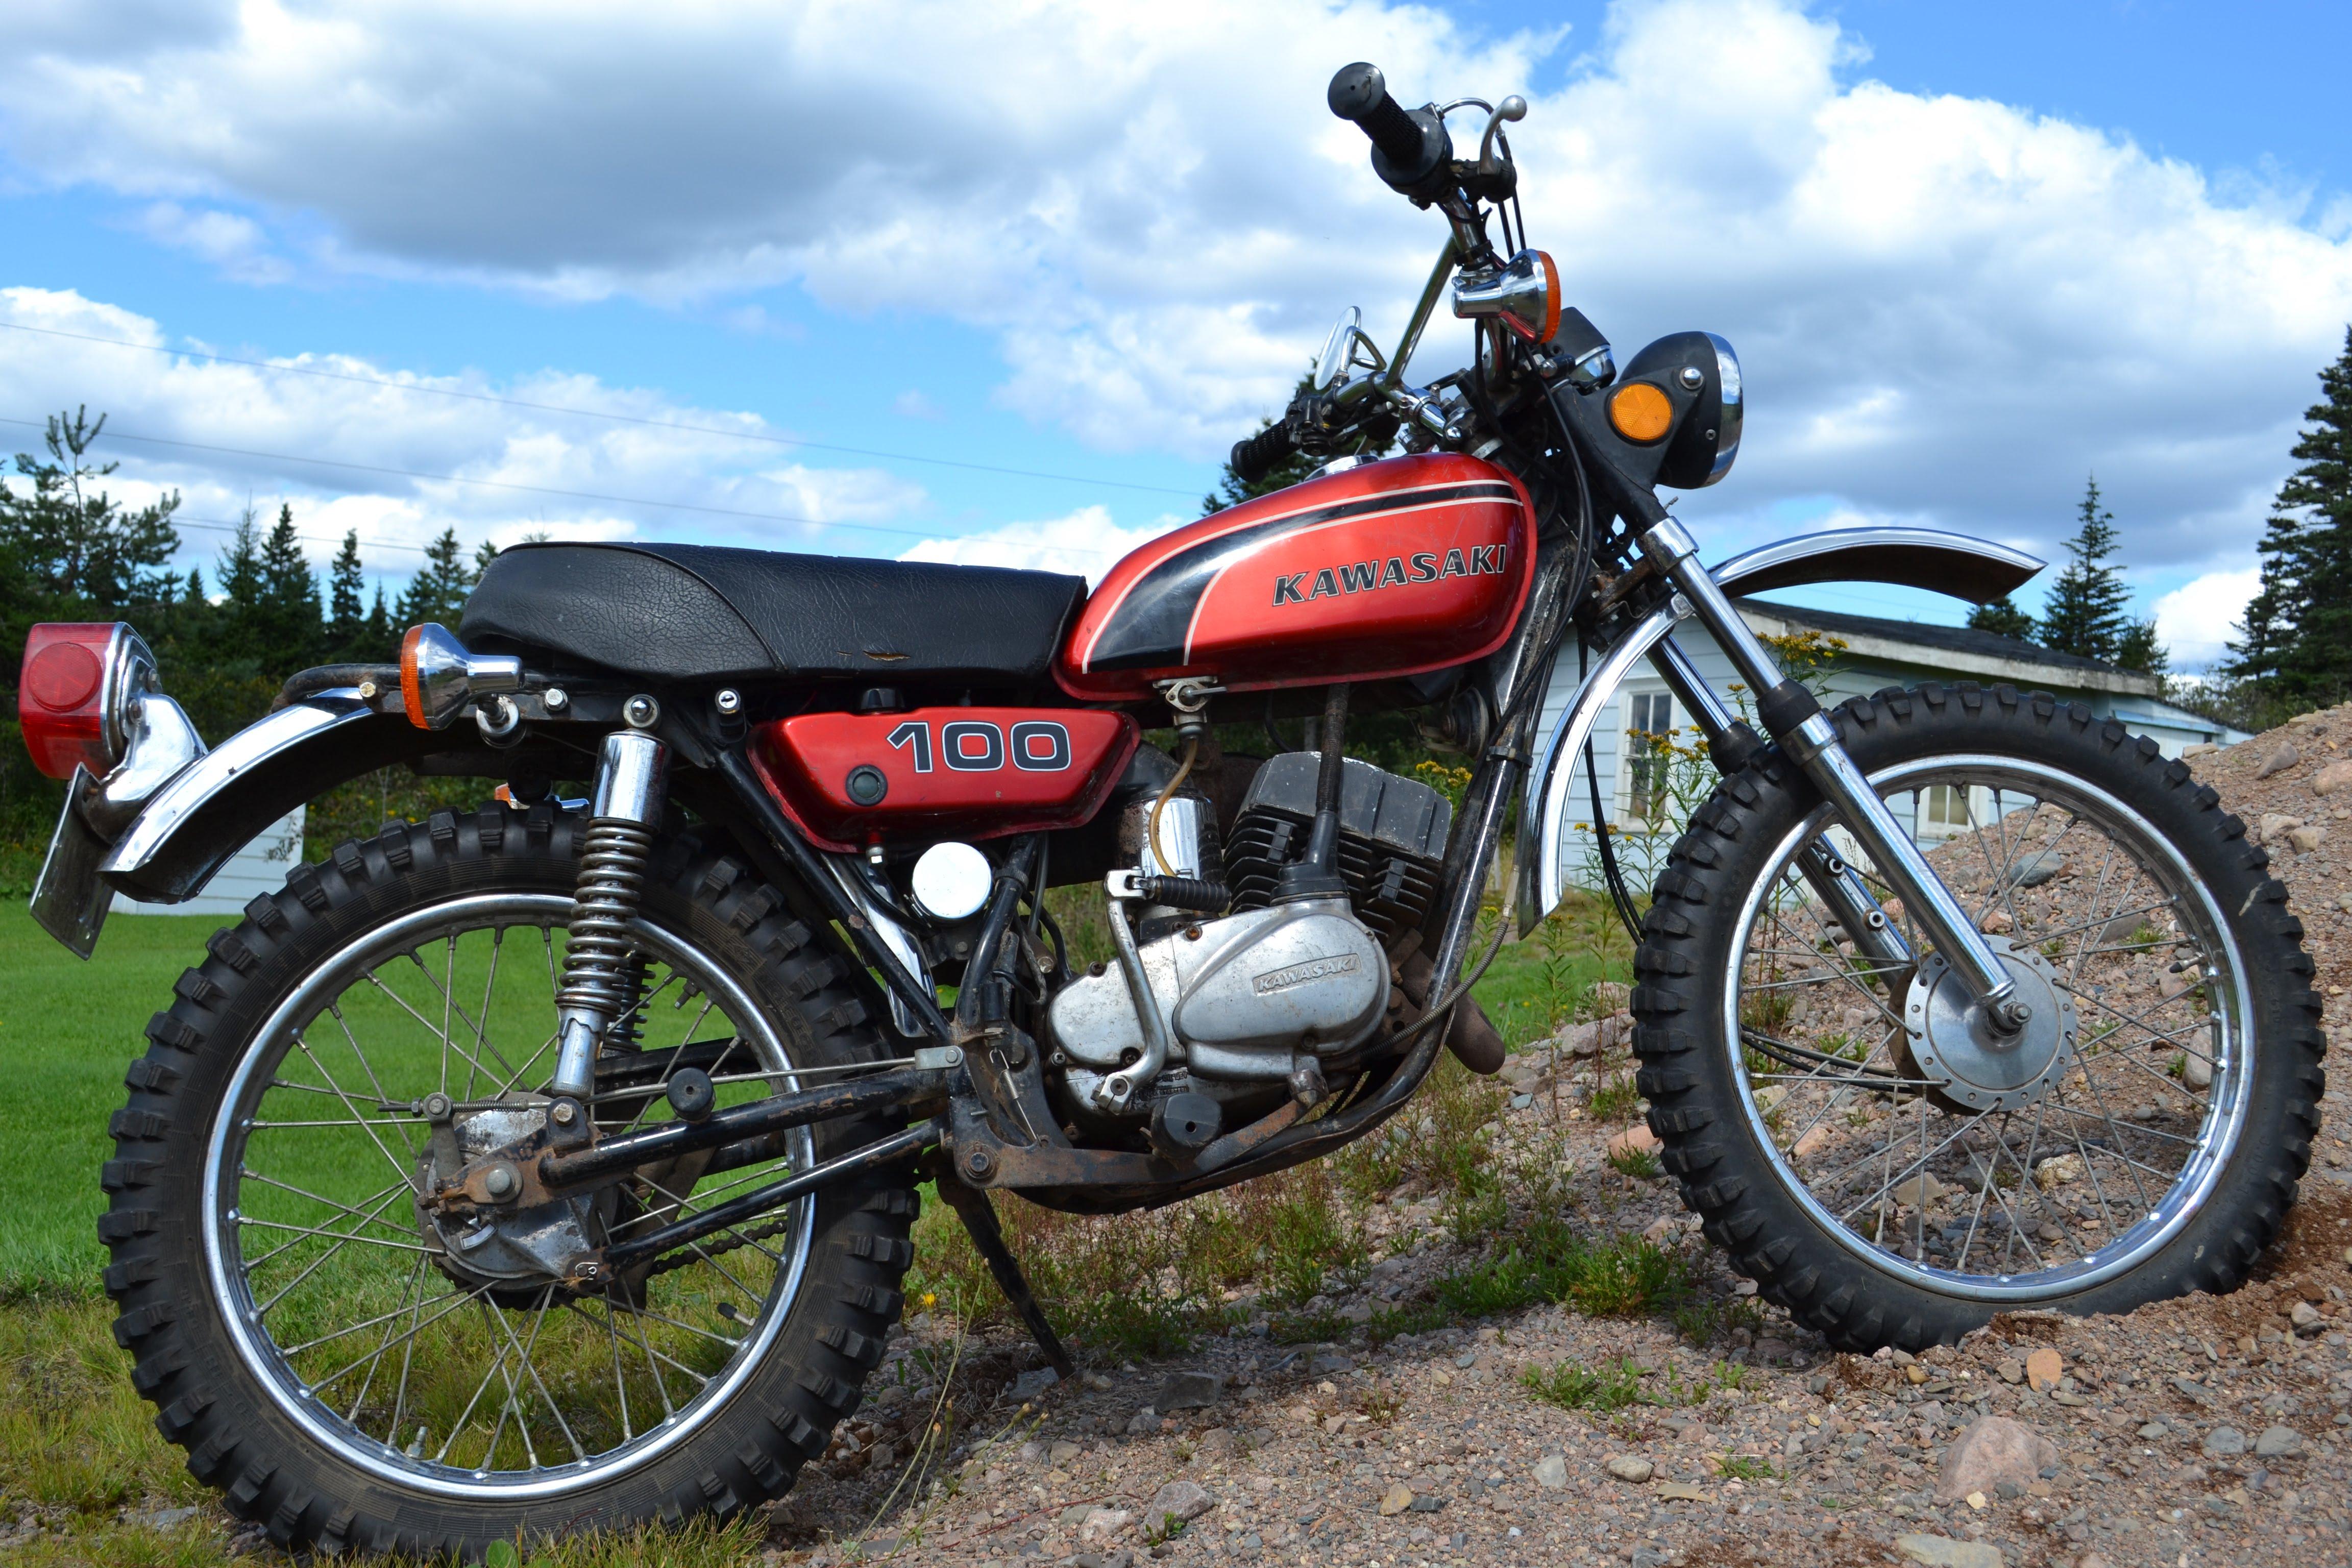 1975 Kawasaki G4tr Wiring Diagram F6 Diagrams Kt250 1974 G4 Tr 100 Home 1972 Enduro Rick Took A Shine To